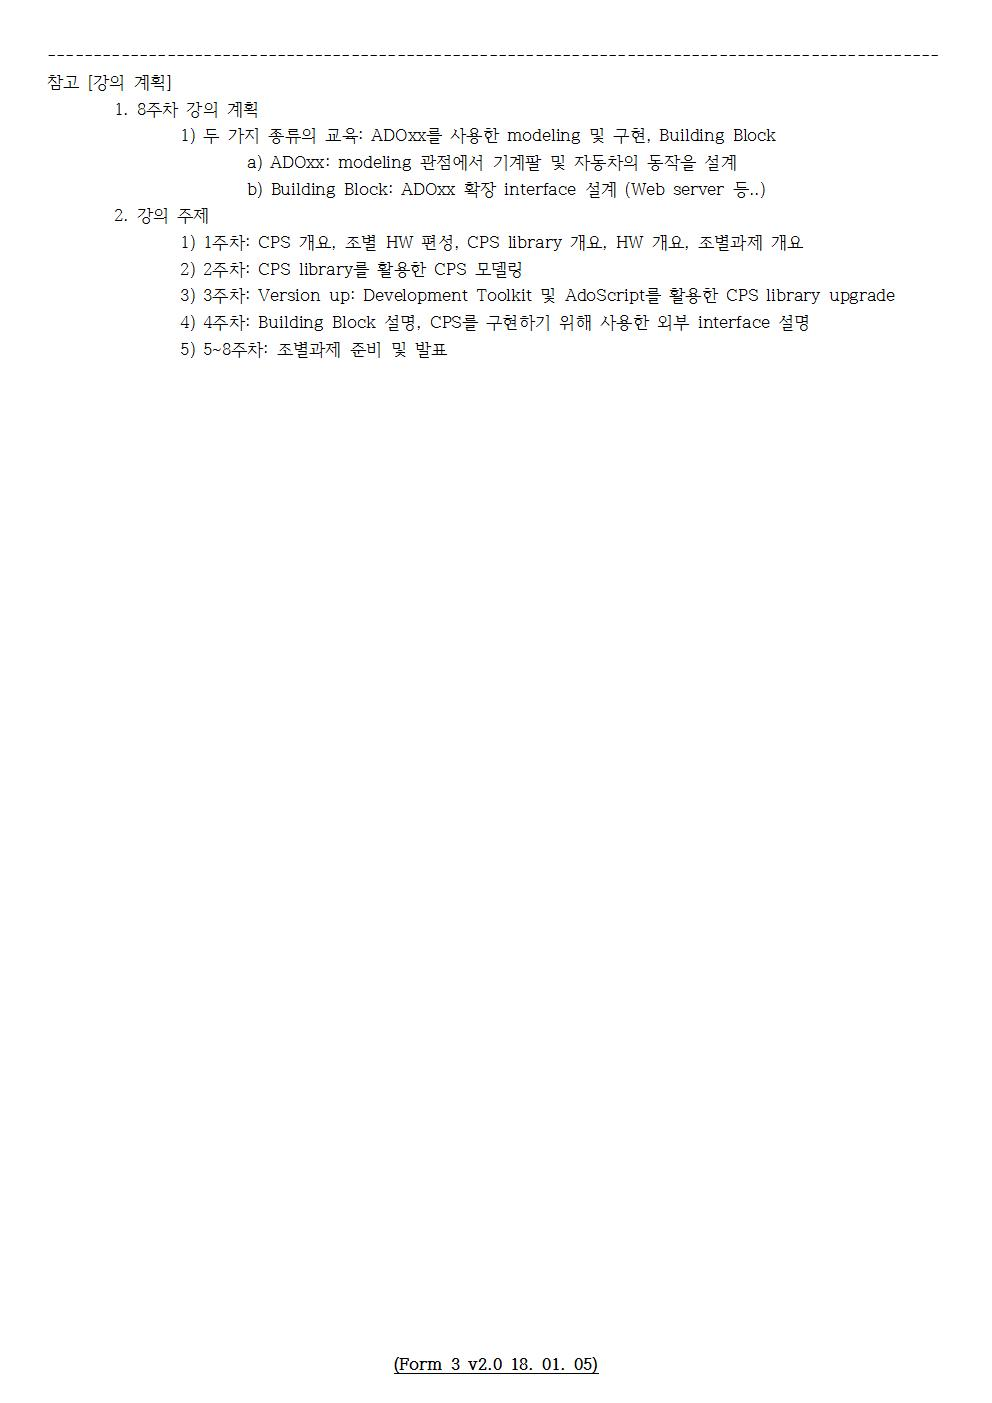 D-[18-004-RD-04]-[우주기초 과제]-[2018-06-28][SH]002.jpg